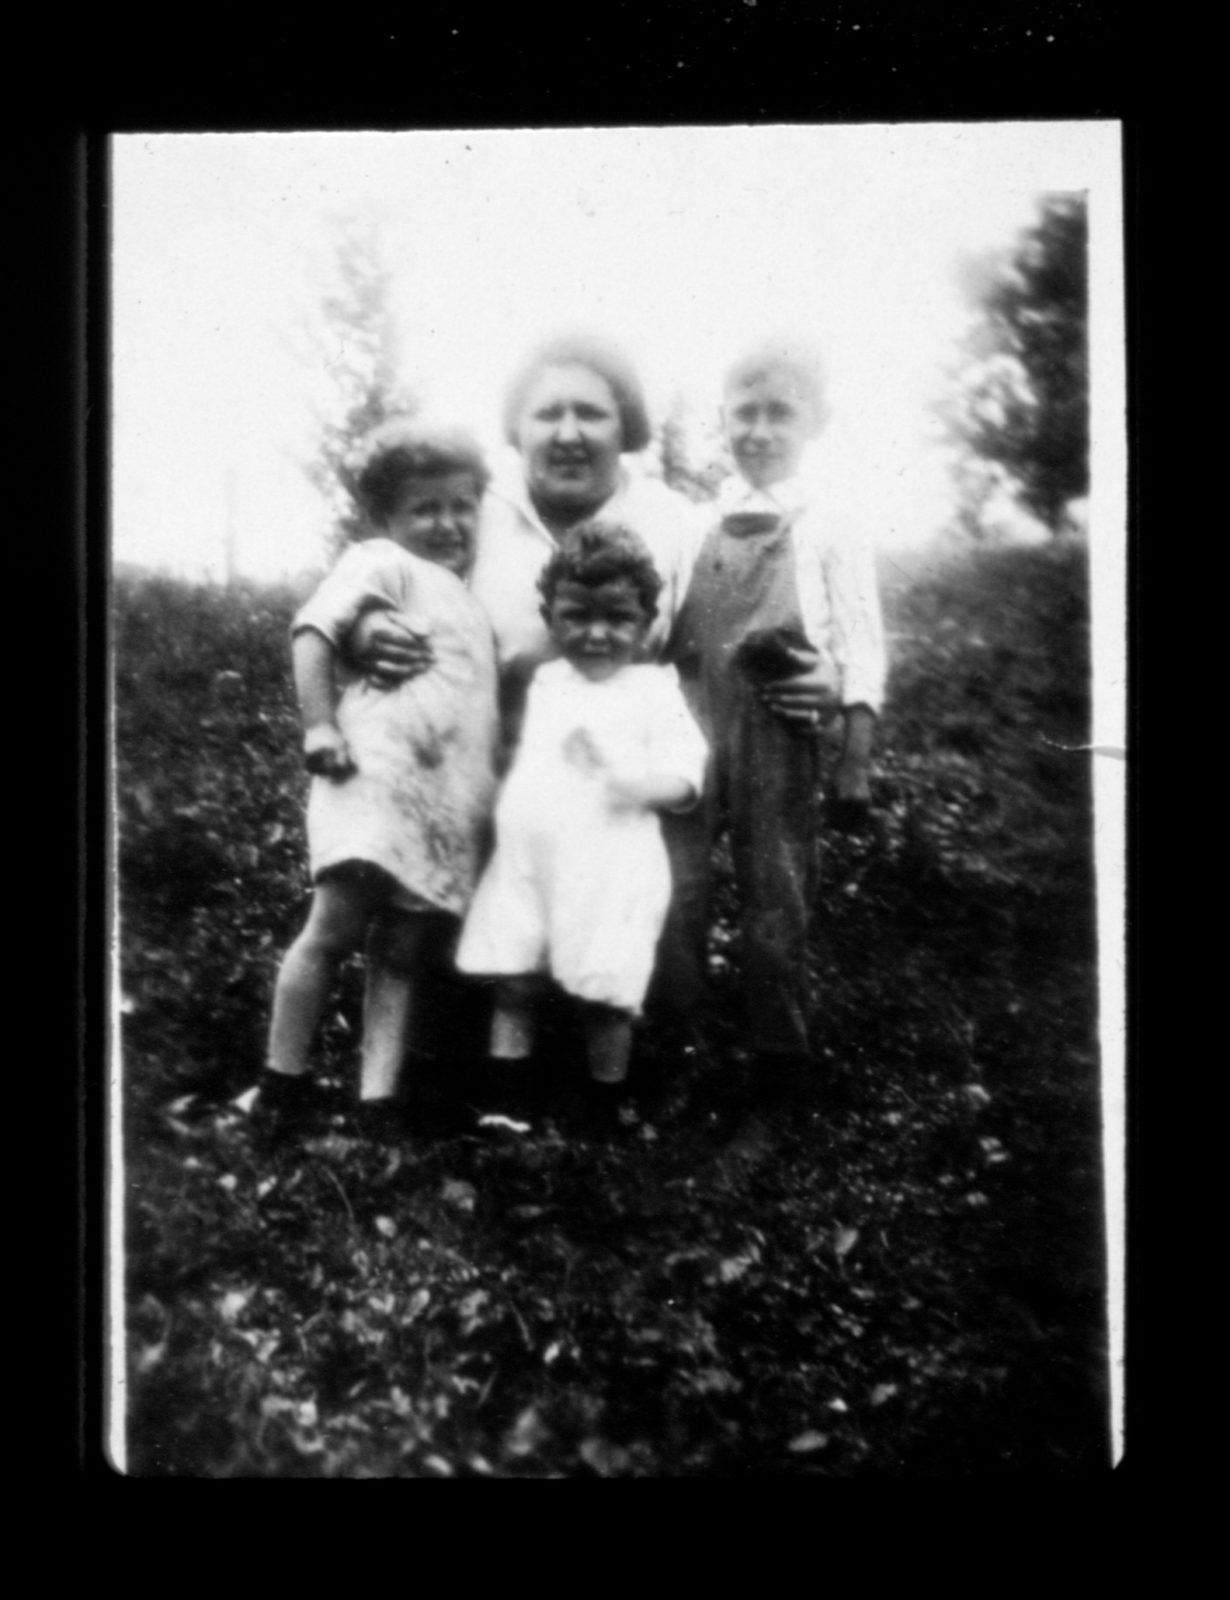 Photo of Bessie Rogarshevsky and her three children circa 1920s.